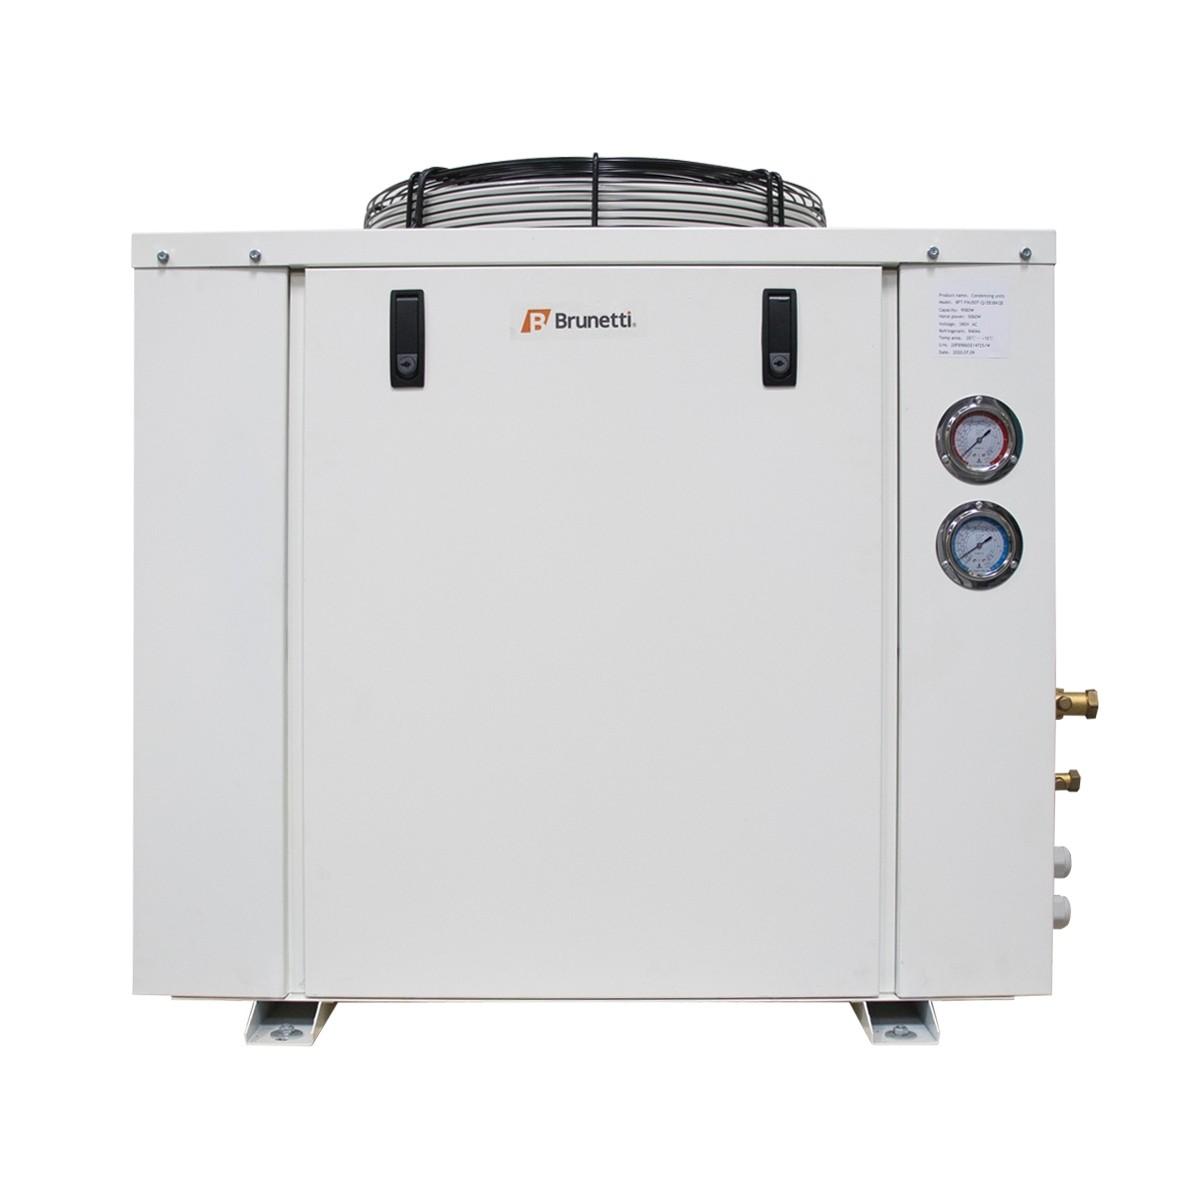 Unidad Condensadora MT Brunetti UCMT-C-50B 5HP